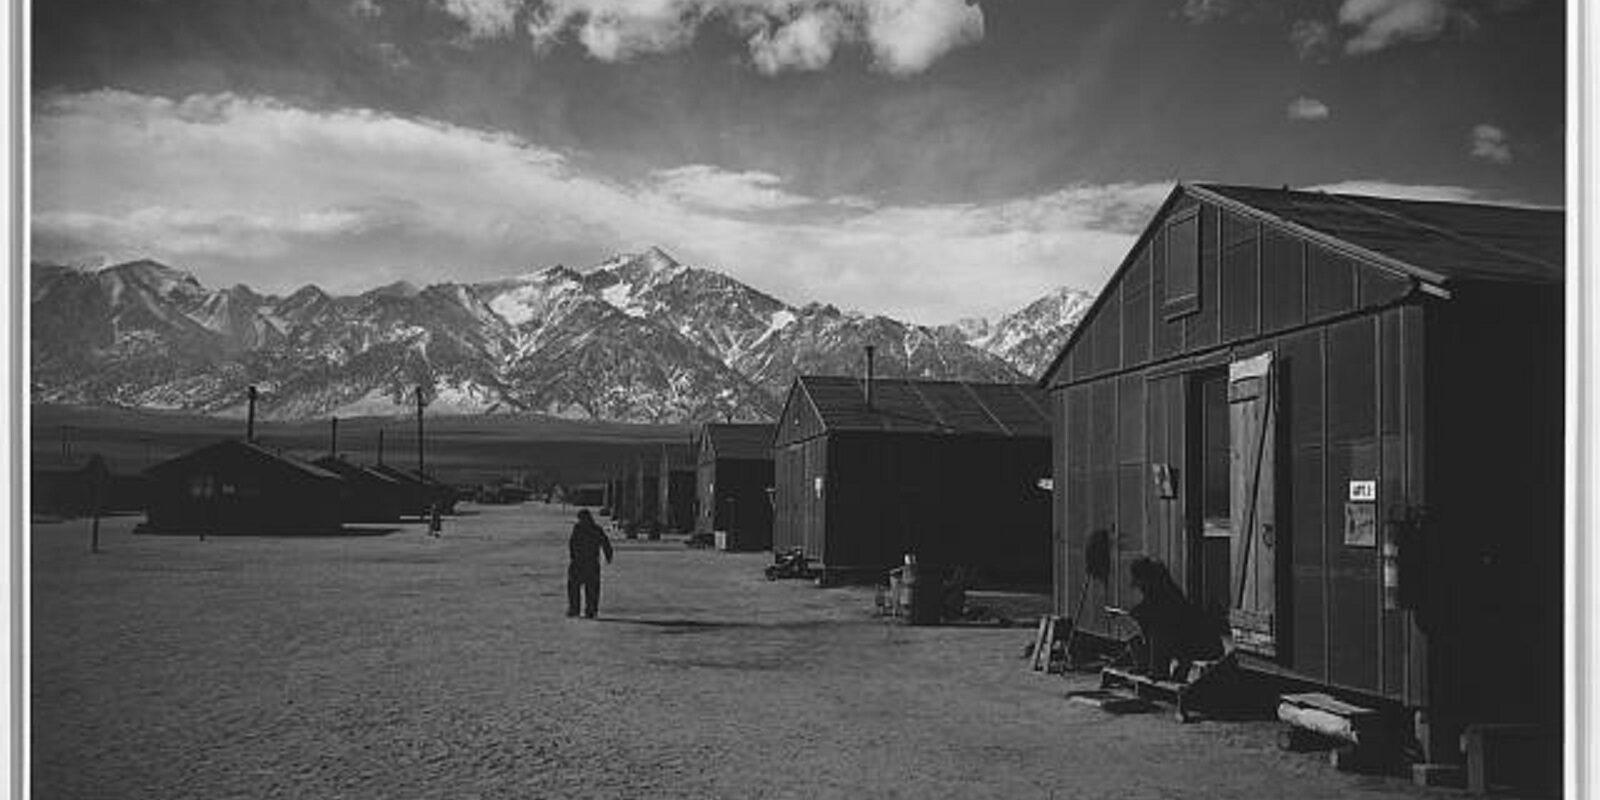 Manzanar street scene, Winter (1943)